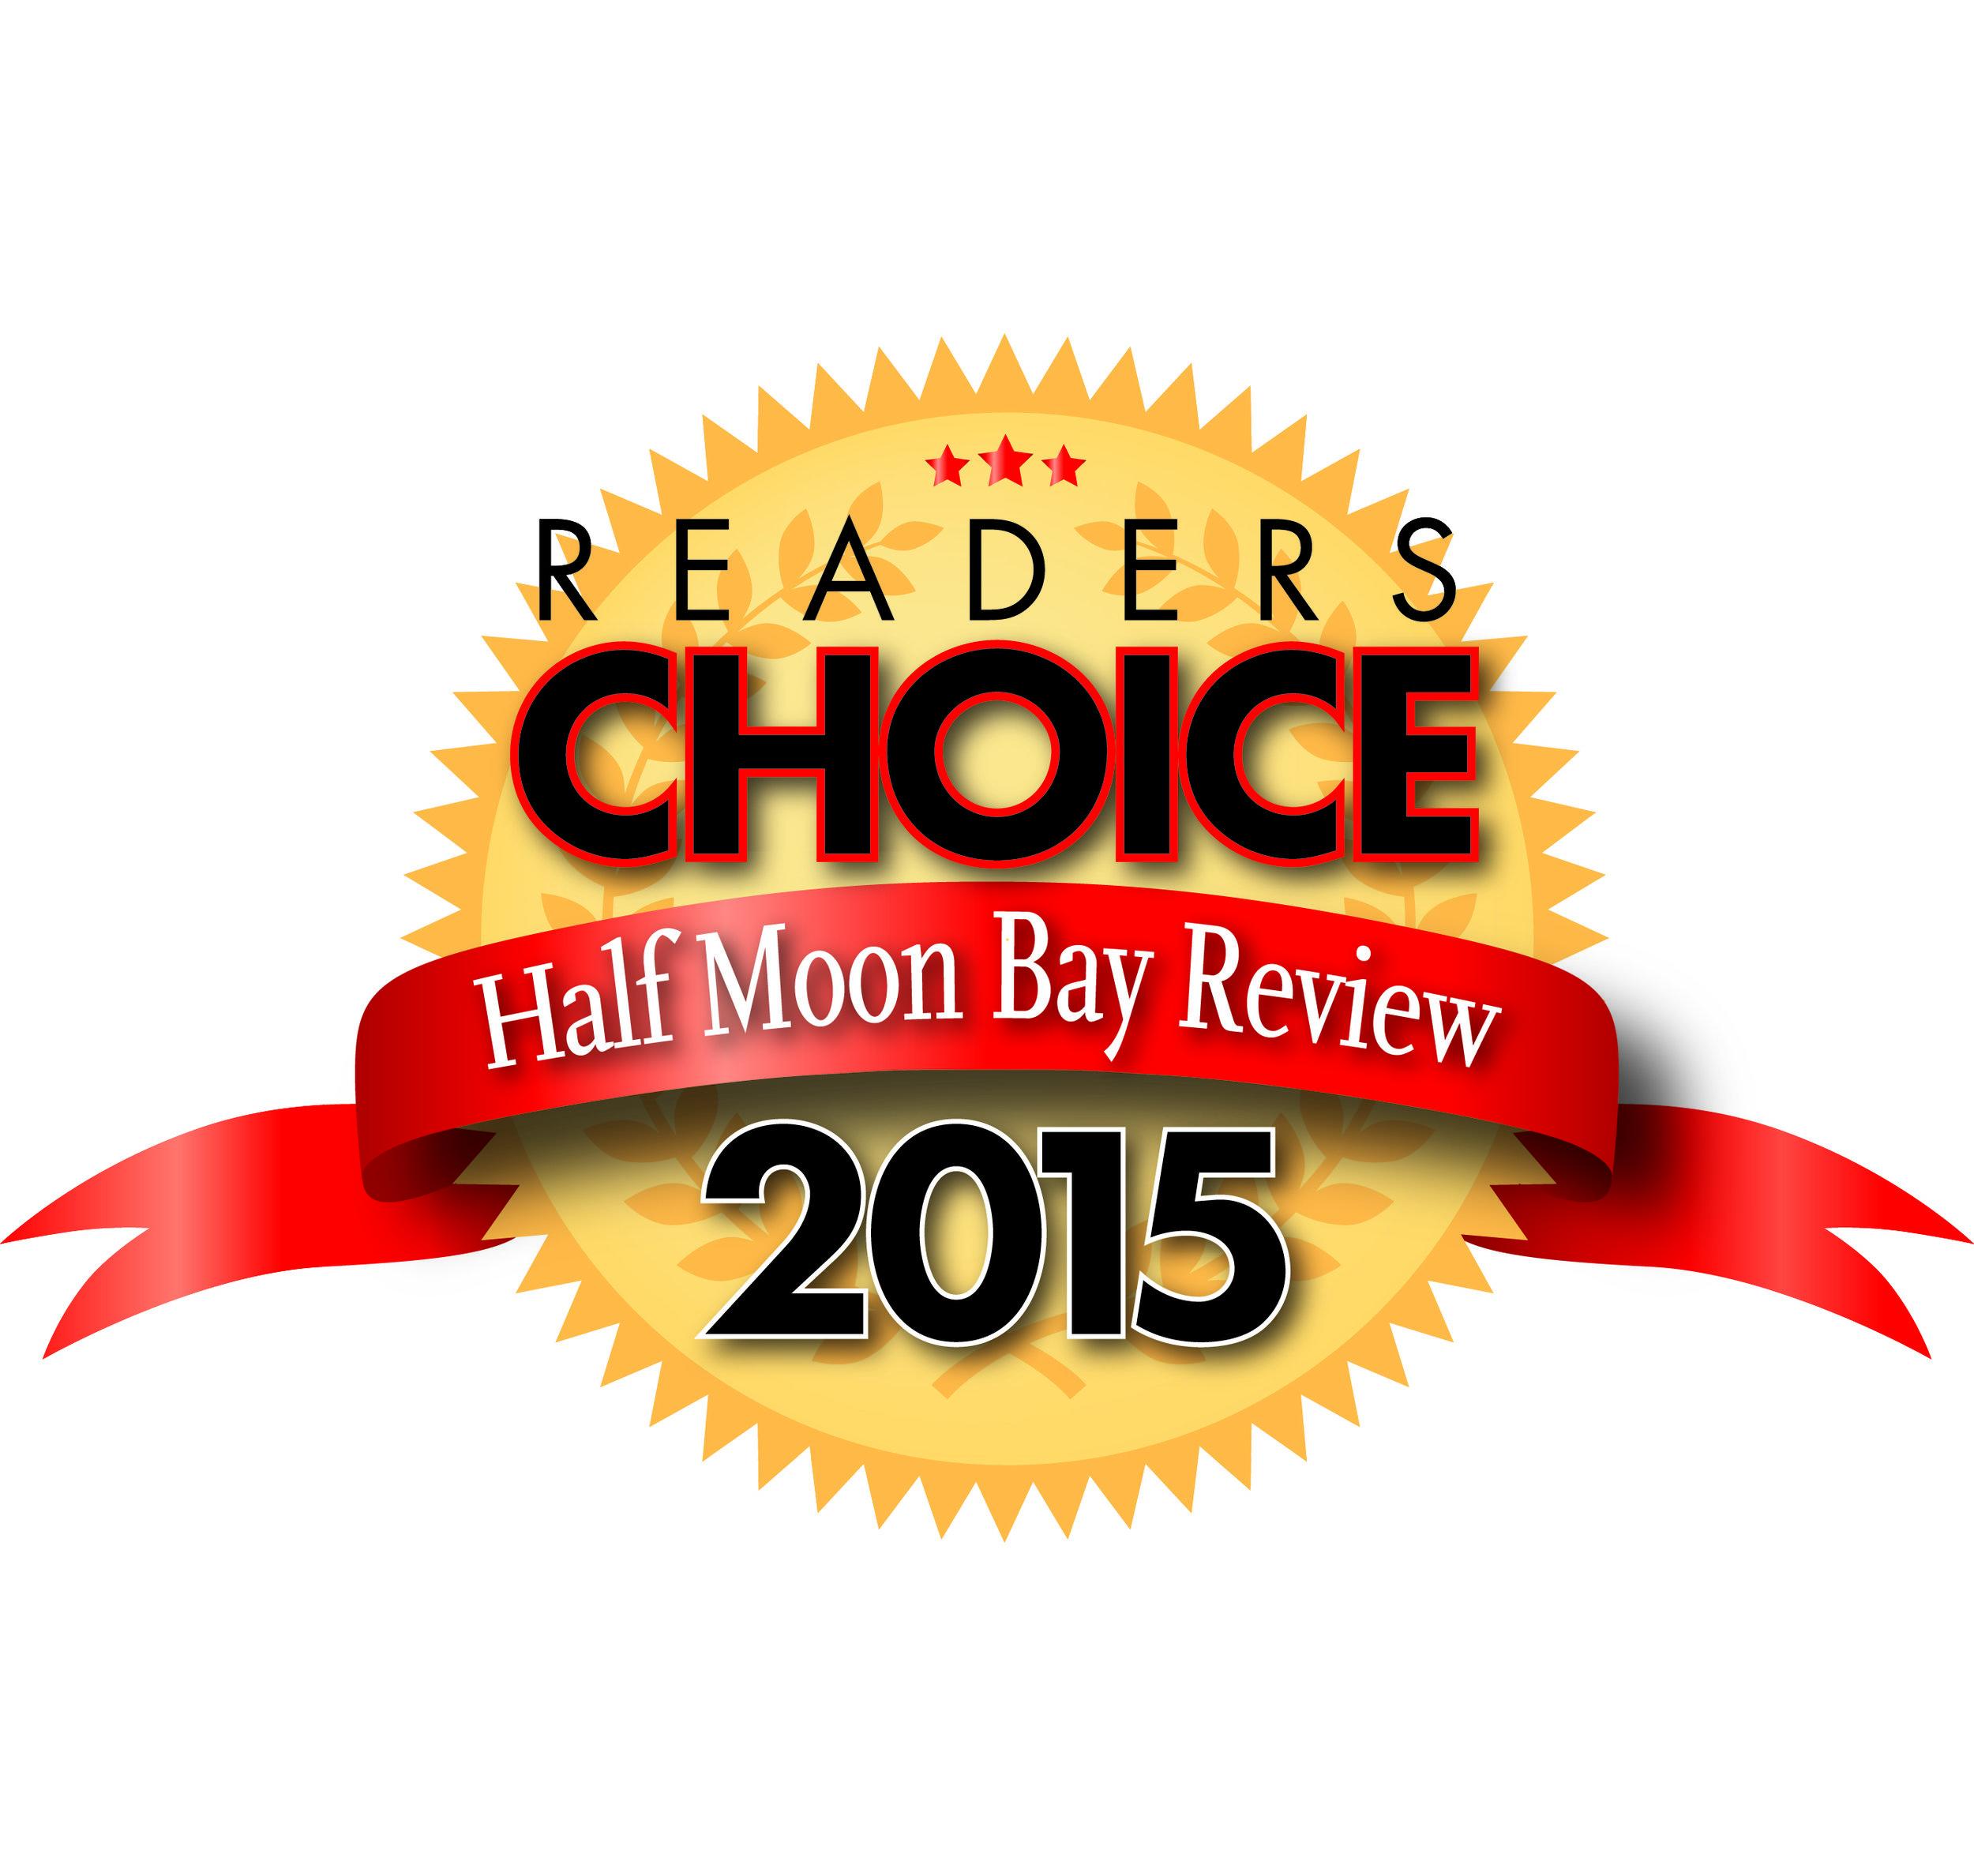 Readers Choice_2015_logo.jpg